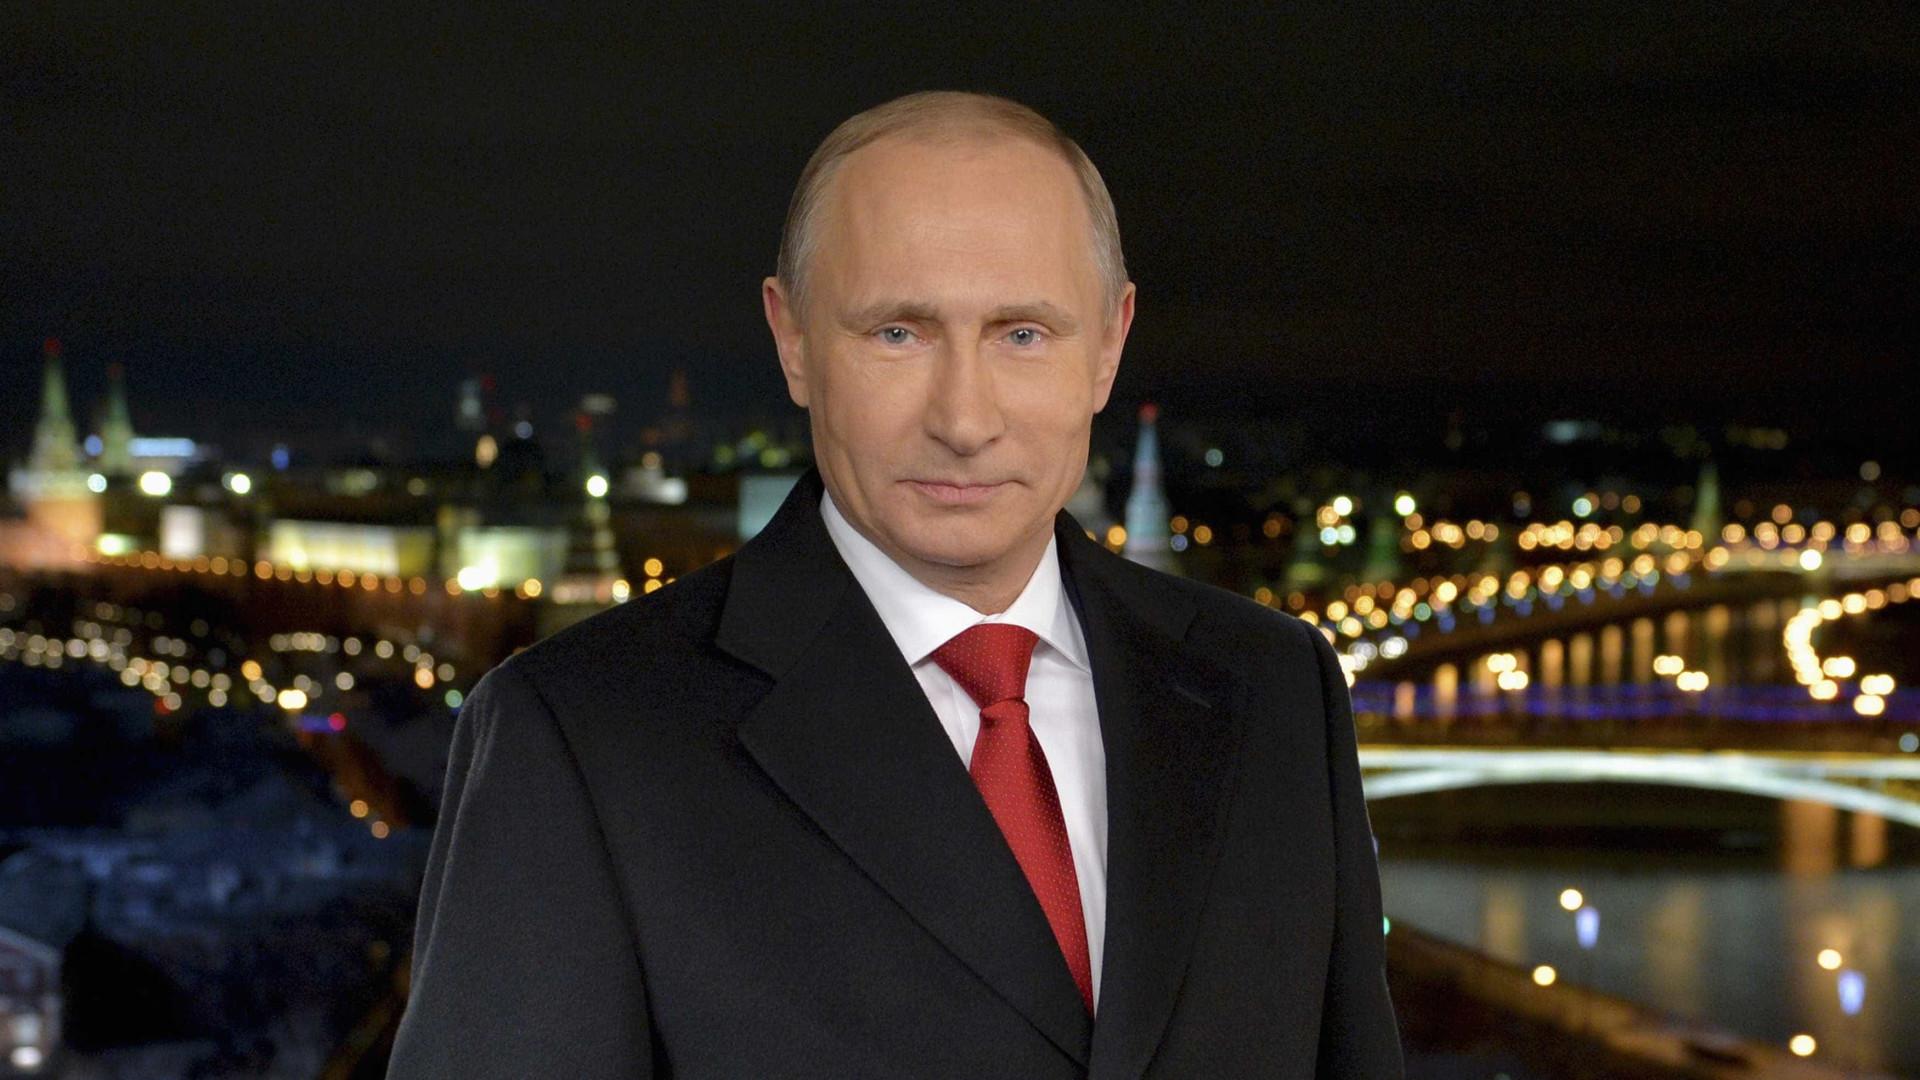 Vladimir Putin anuncia que é candidato às presidenciais de 2018